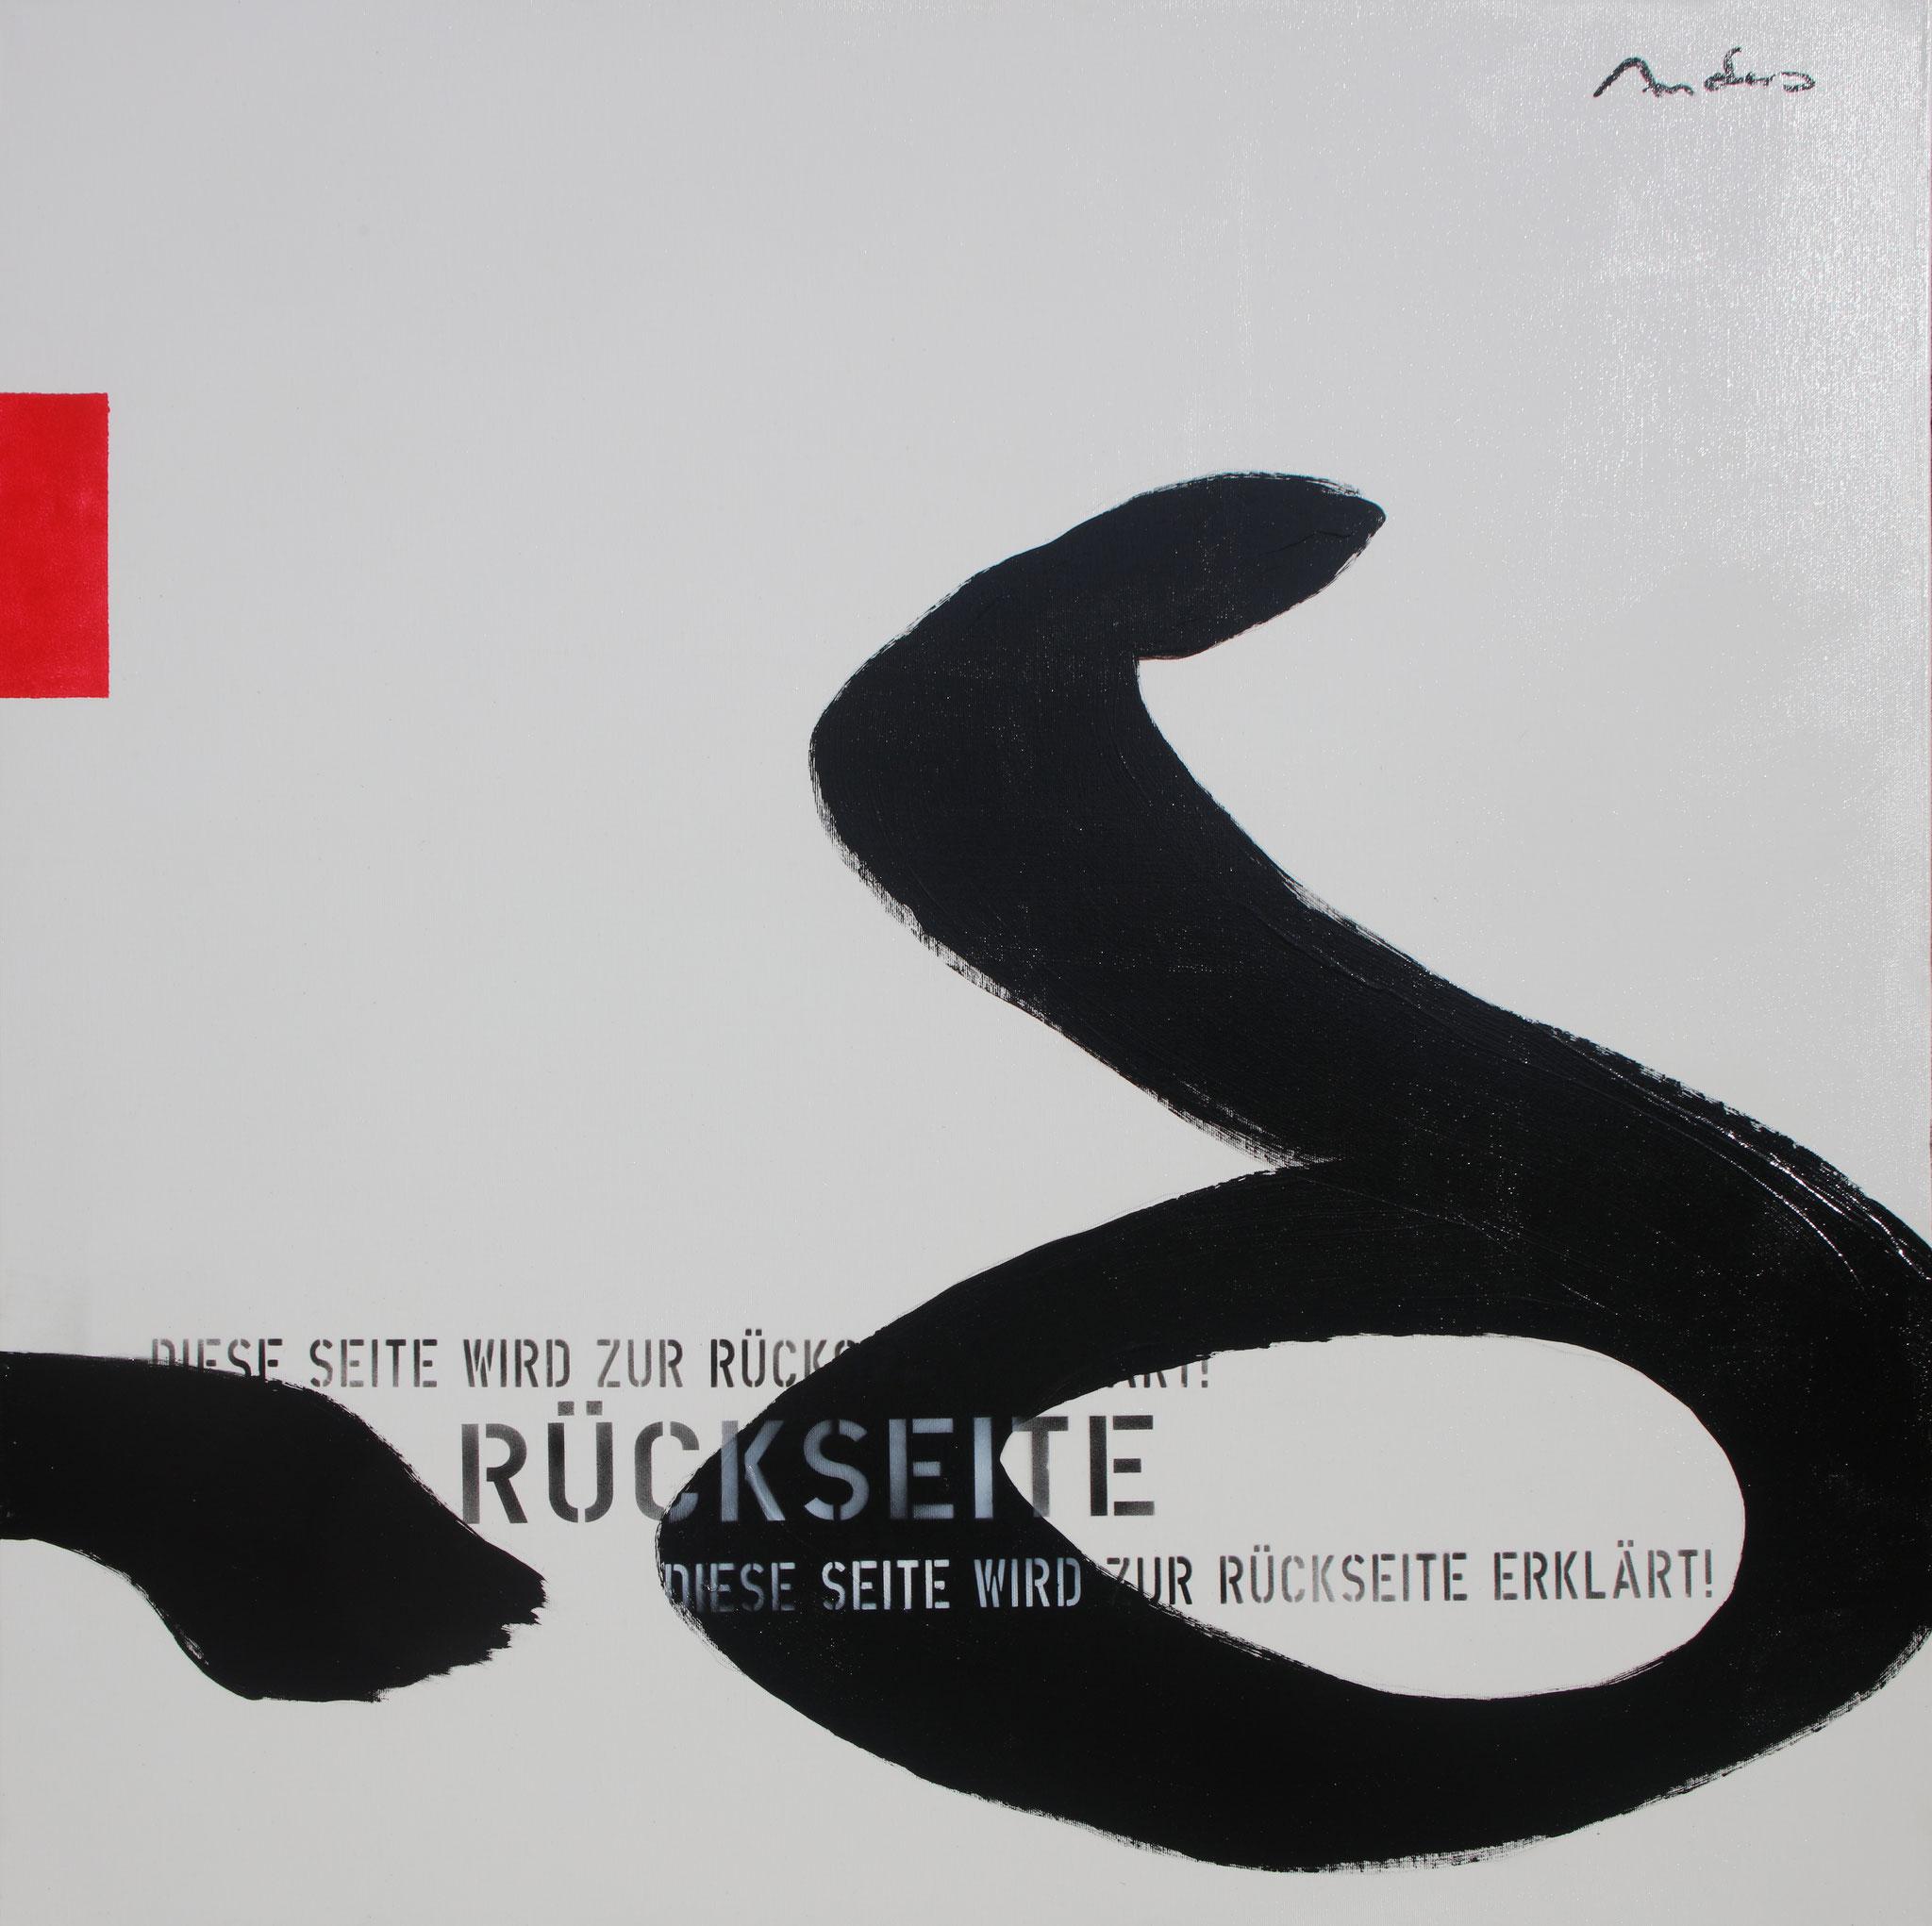 Heureka V - Rückseite - Acryl-/Mischtechnik auf Leinwand - 100 x 100 cm